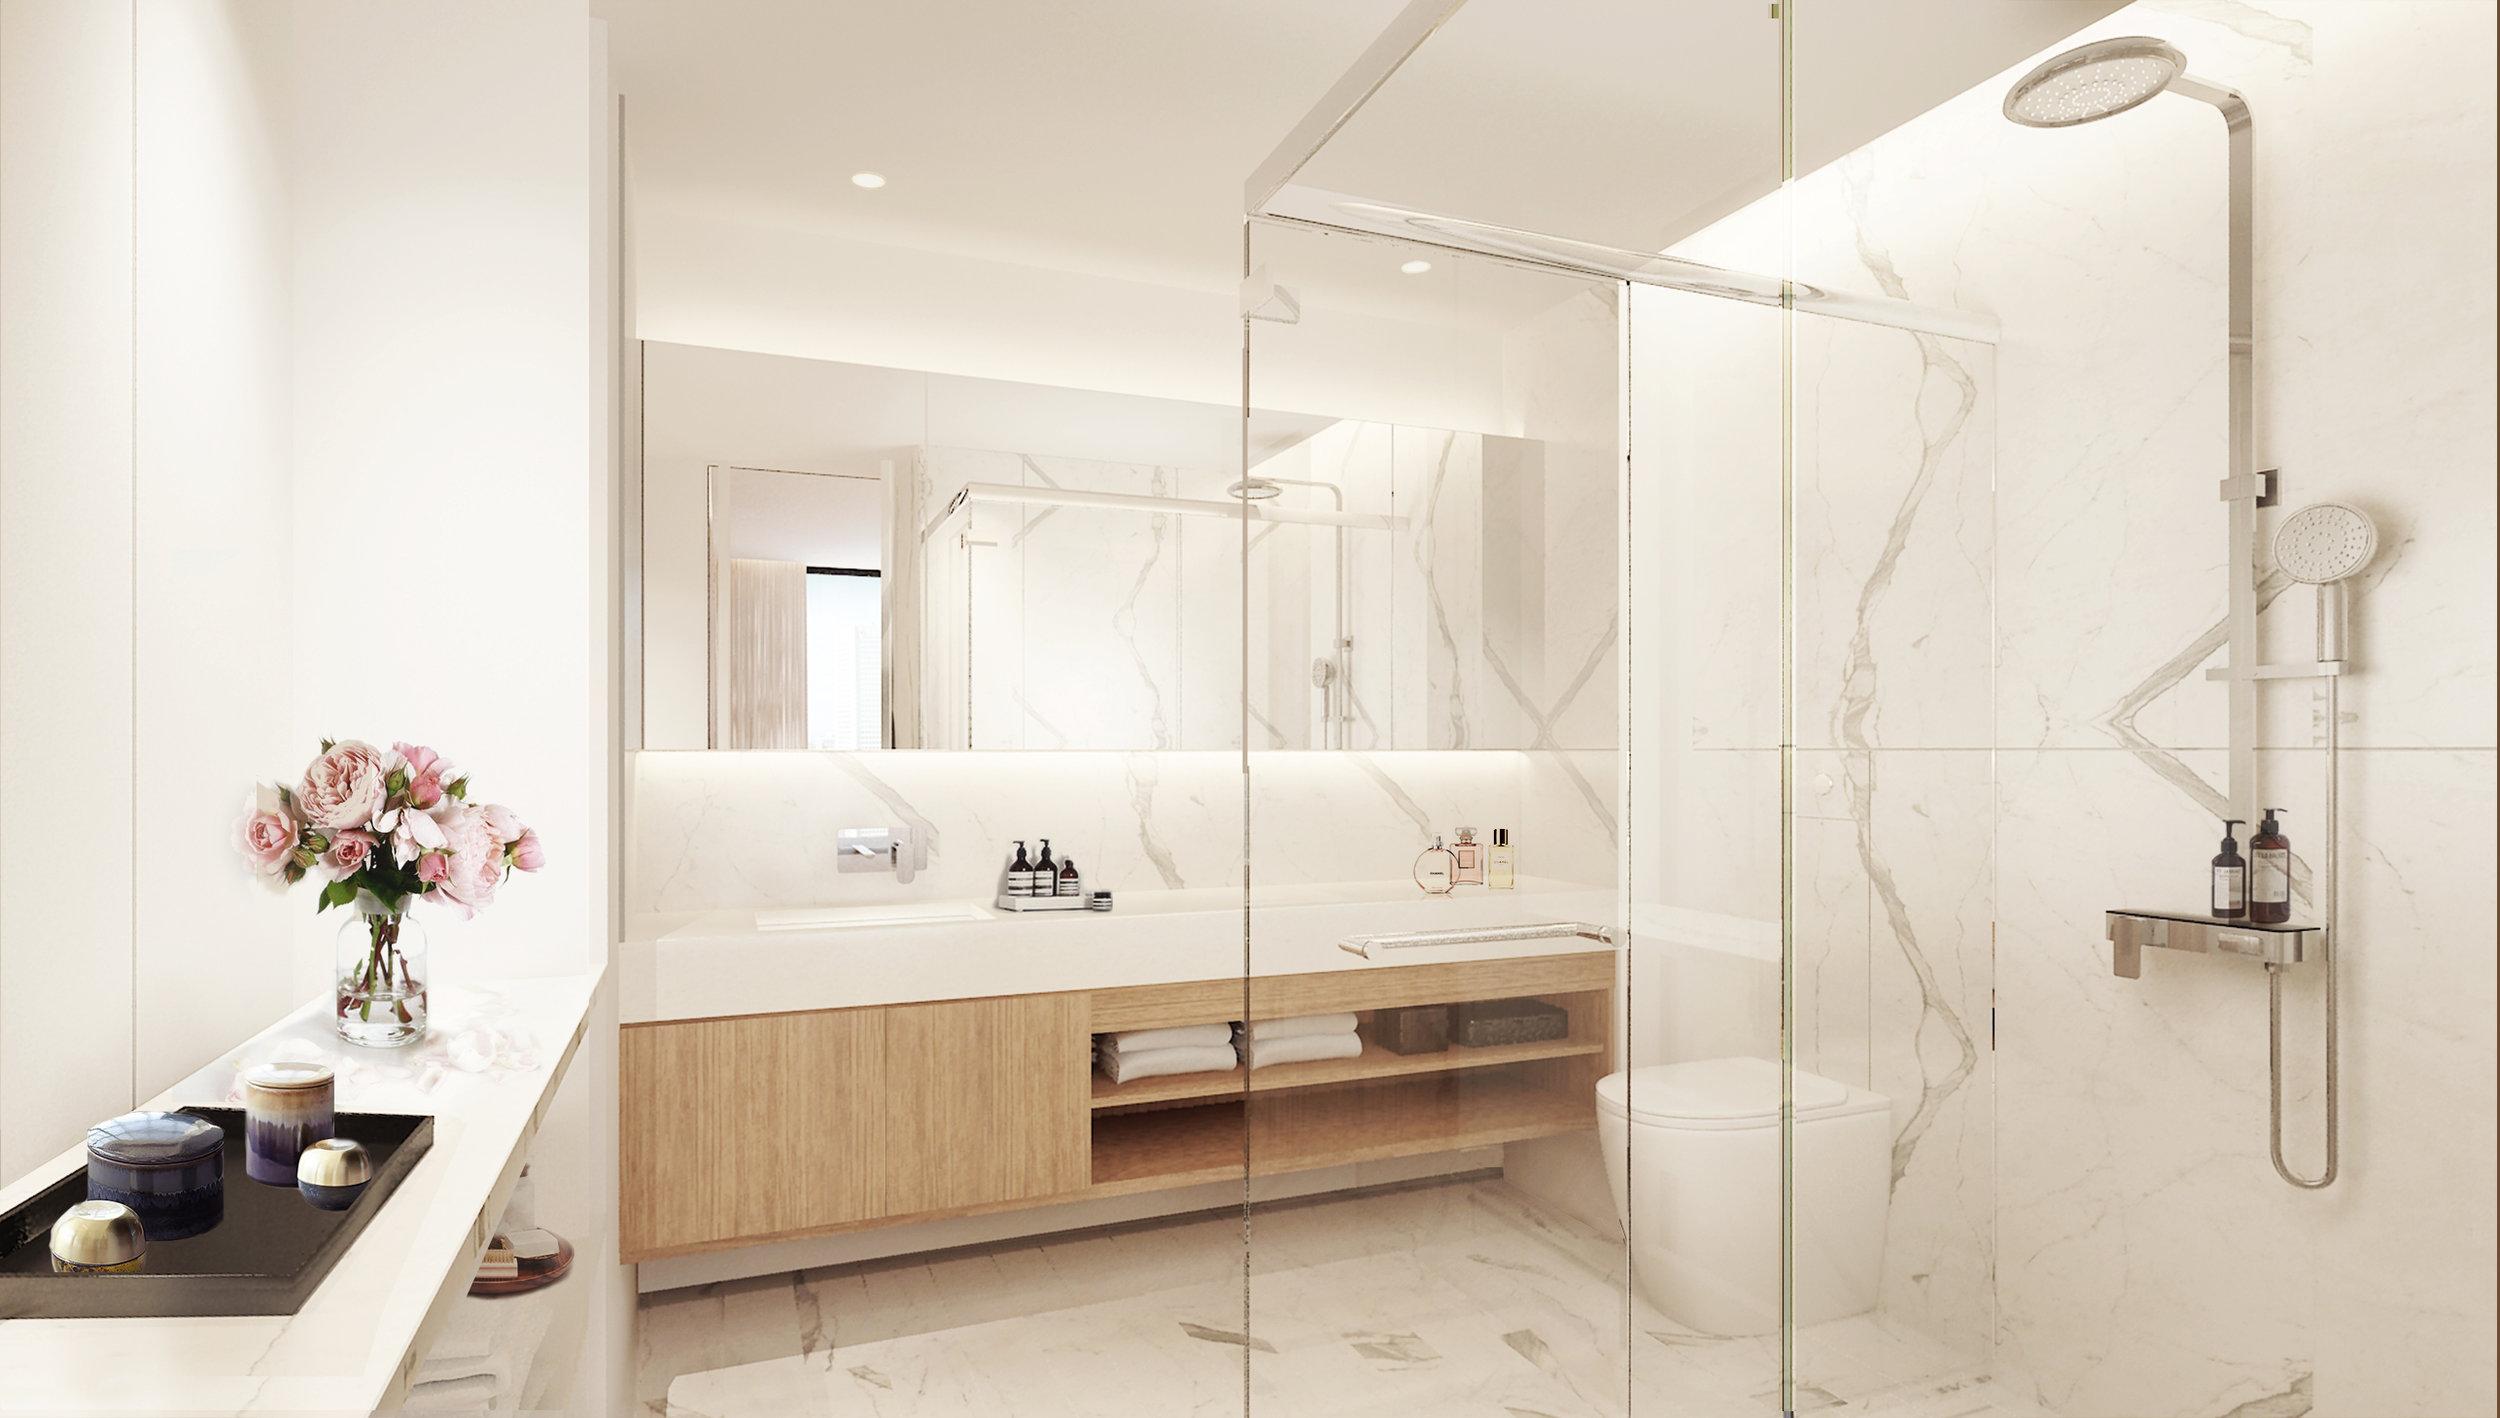 BOIFFILS-Muniq23-Pers-UNIT-42.5-05-Bathroom.jpg